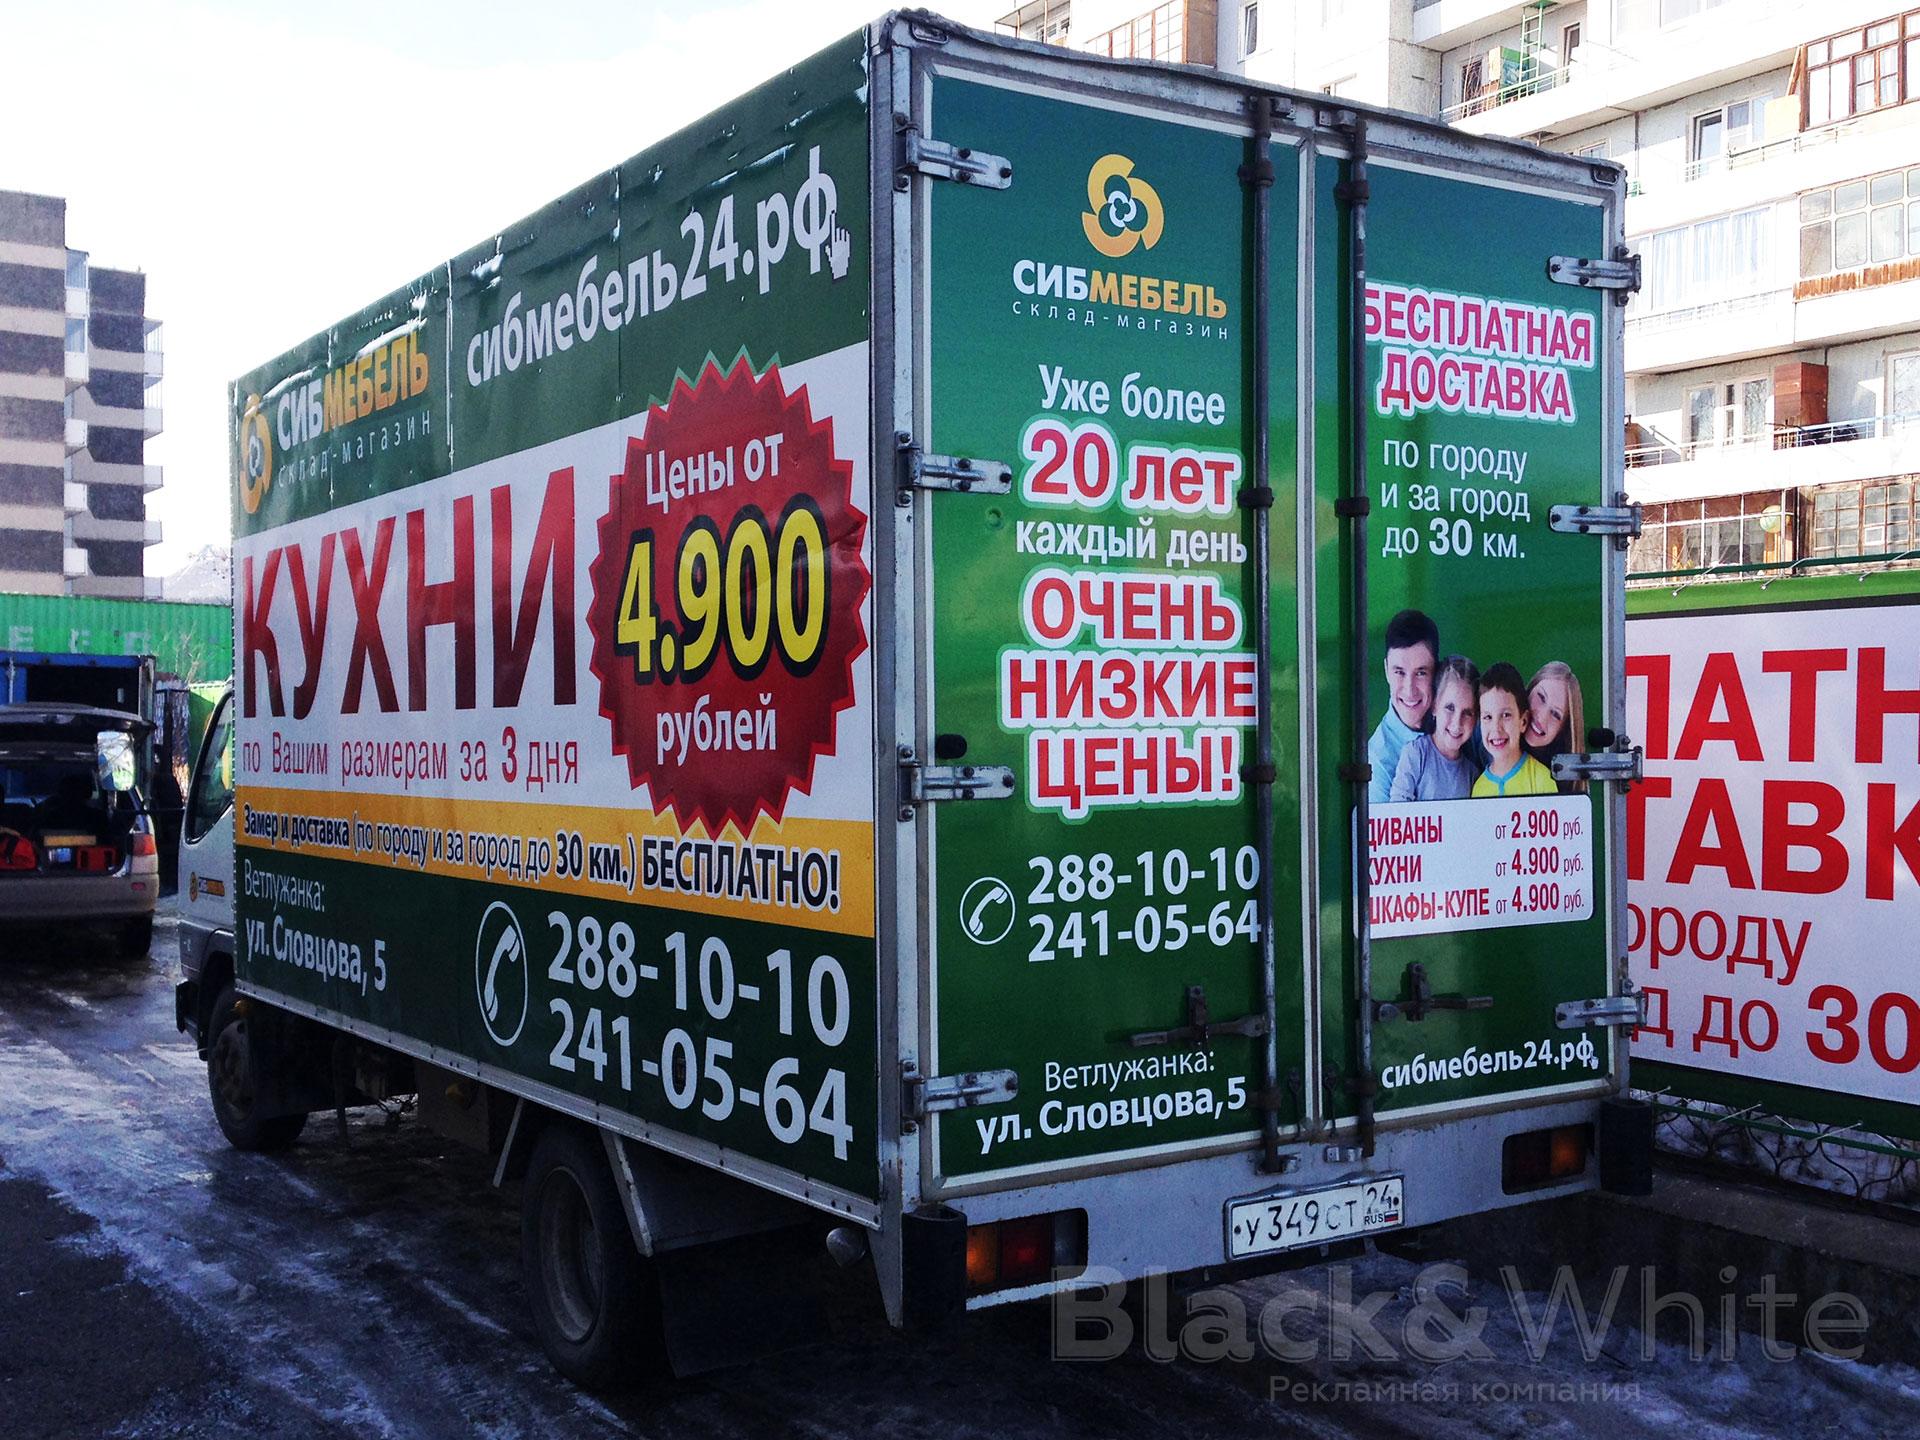 Брендирование-и-оклейка-грузовых-автомобилей-brendirovanie-gruzovyix-avtomobilej-Black&White.jpg